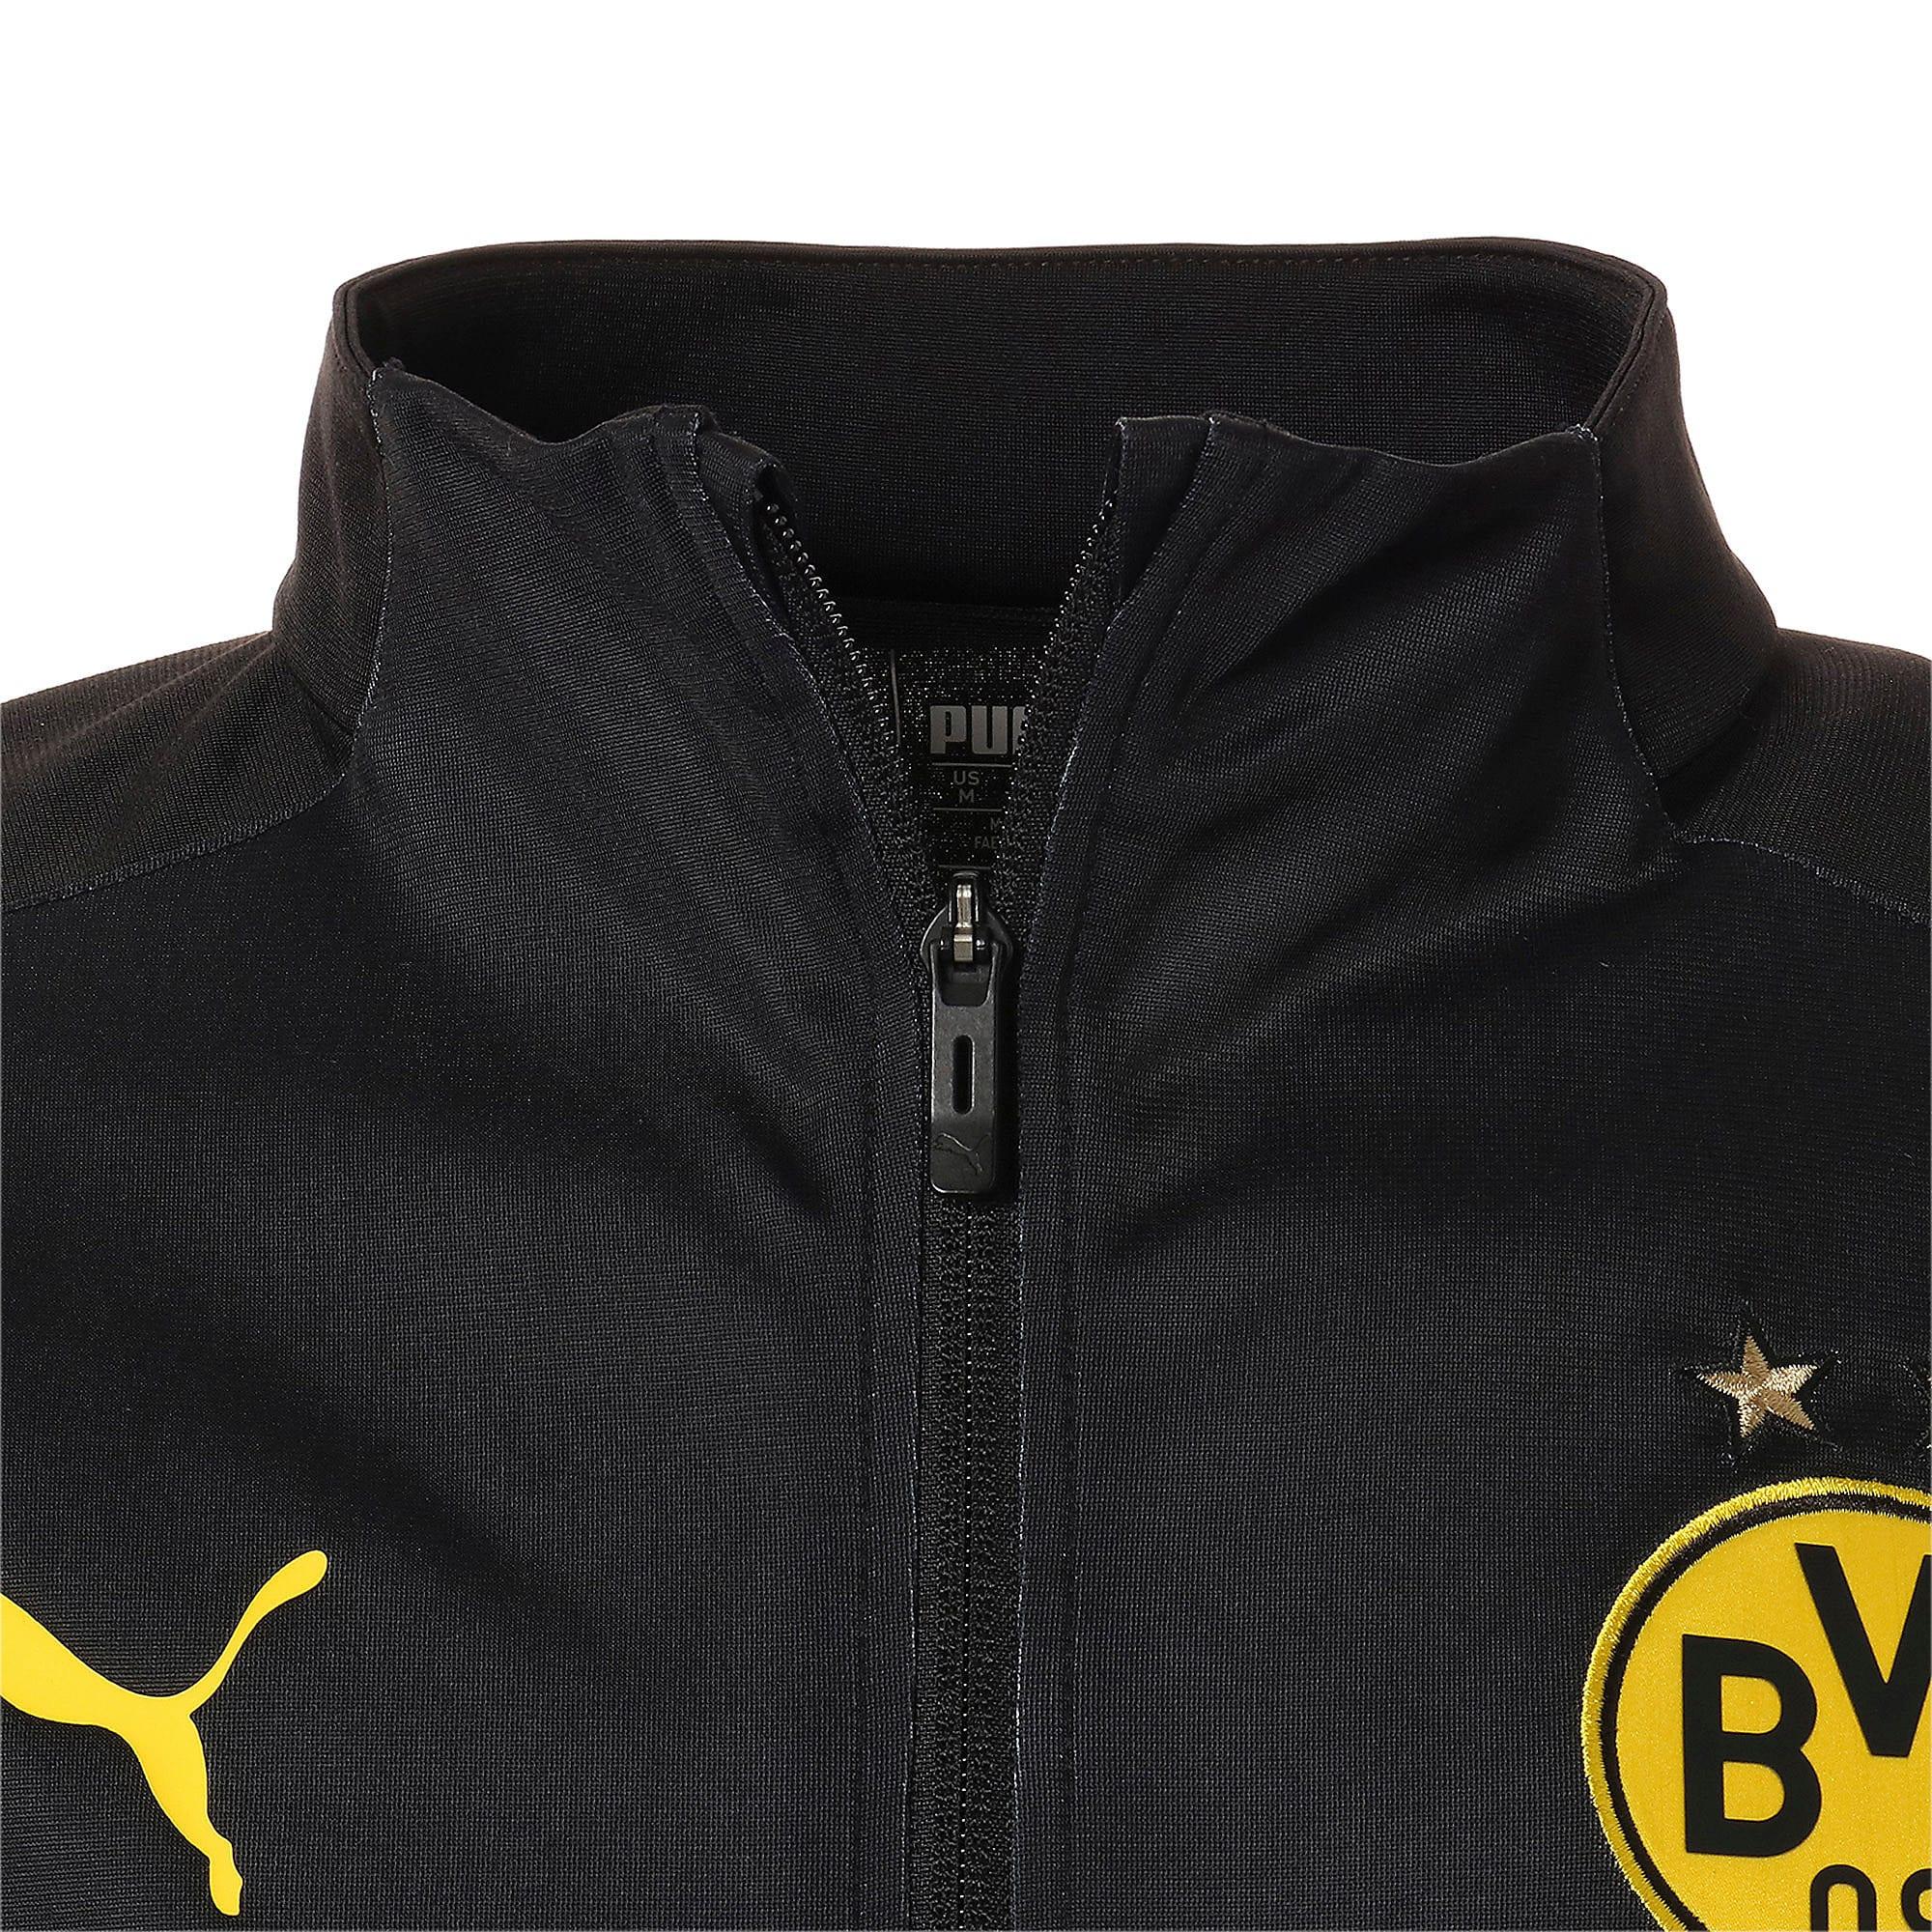 Thumbnail 7 of ドルトムント BVB INT スタジアム ジャケット, Puma Black-Cyber Yellow, medium-JPN